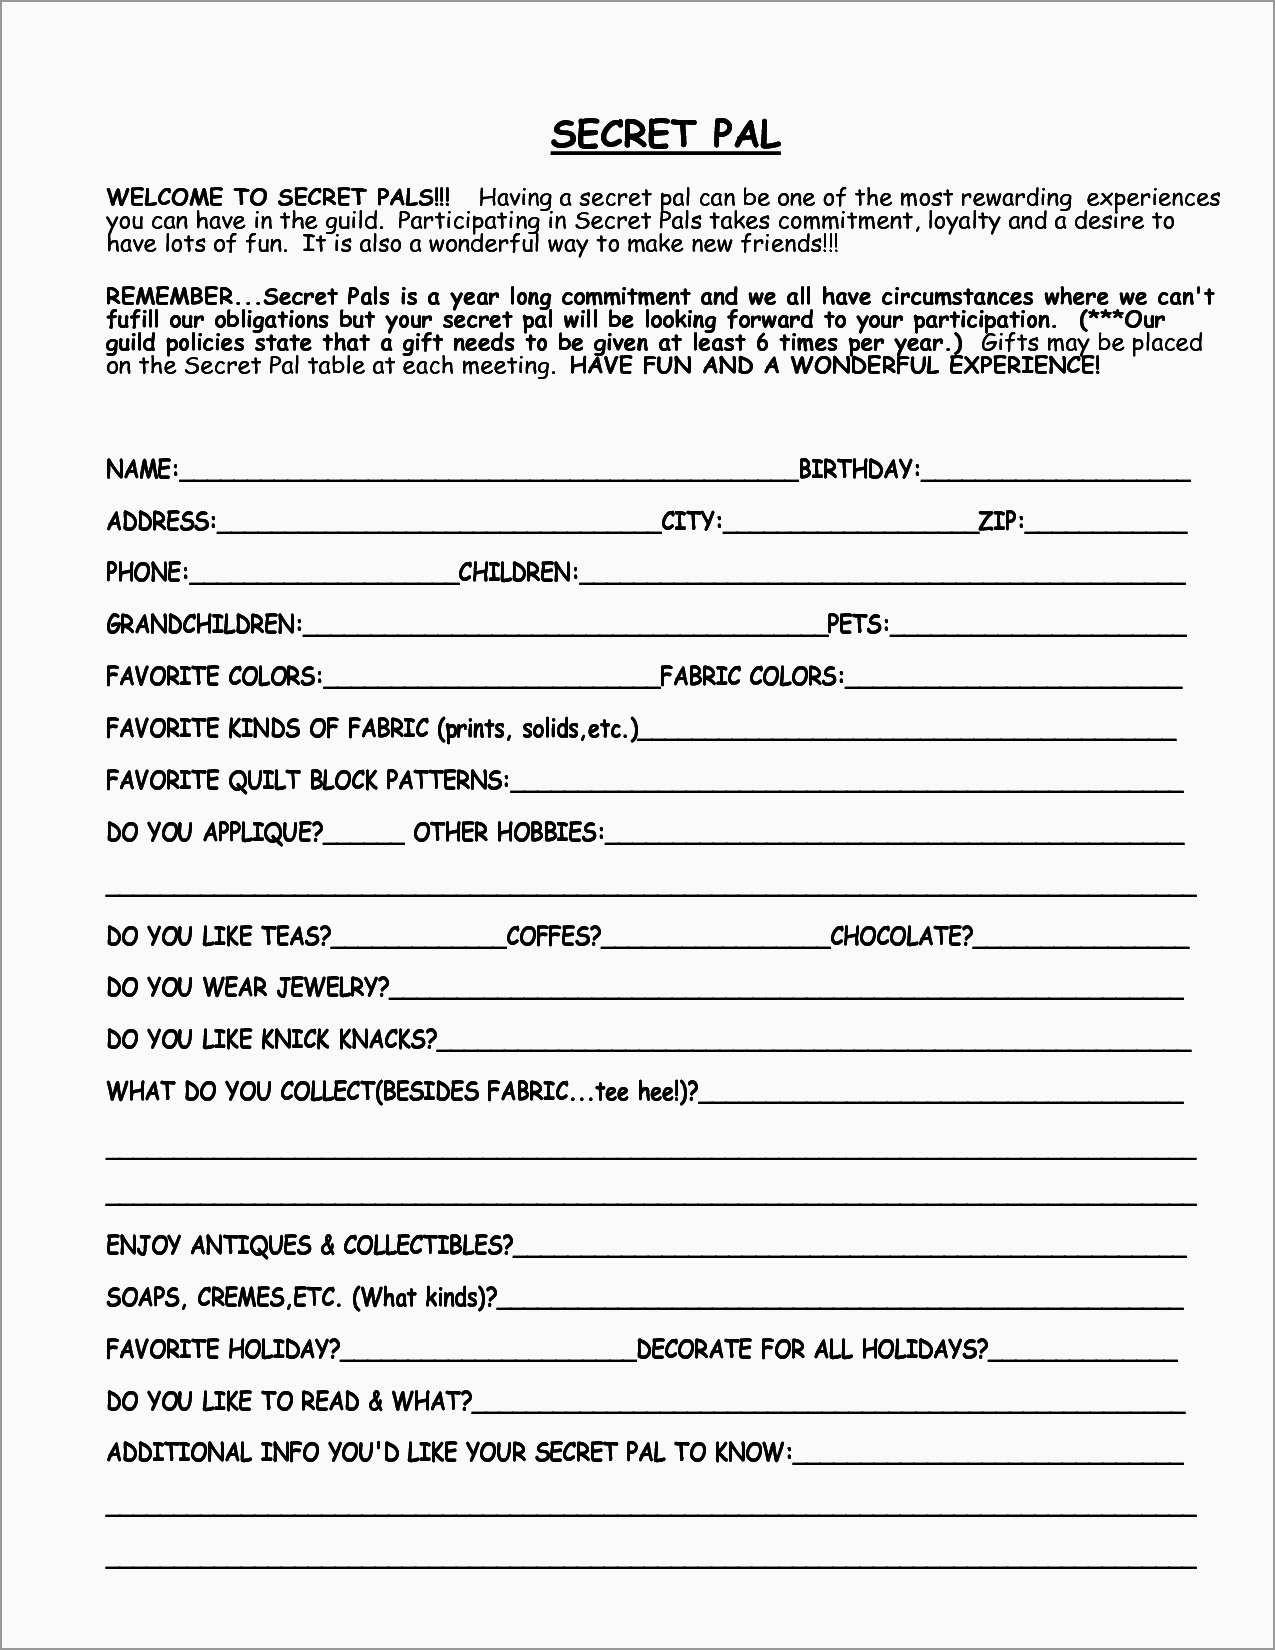 Luxury Free Printable Survey Template | Best Of Template - Make A Printable Survey Free